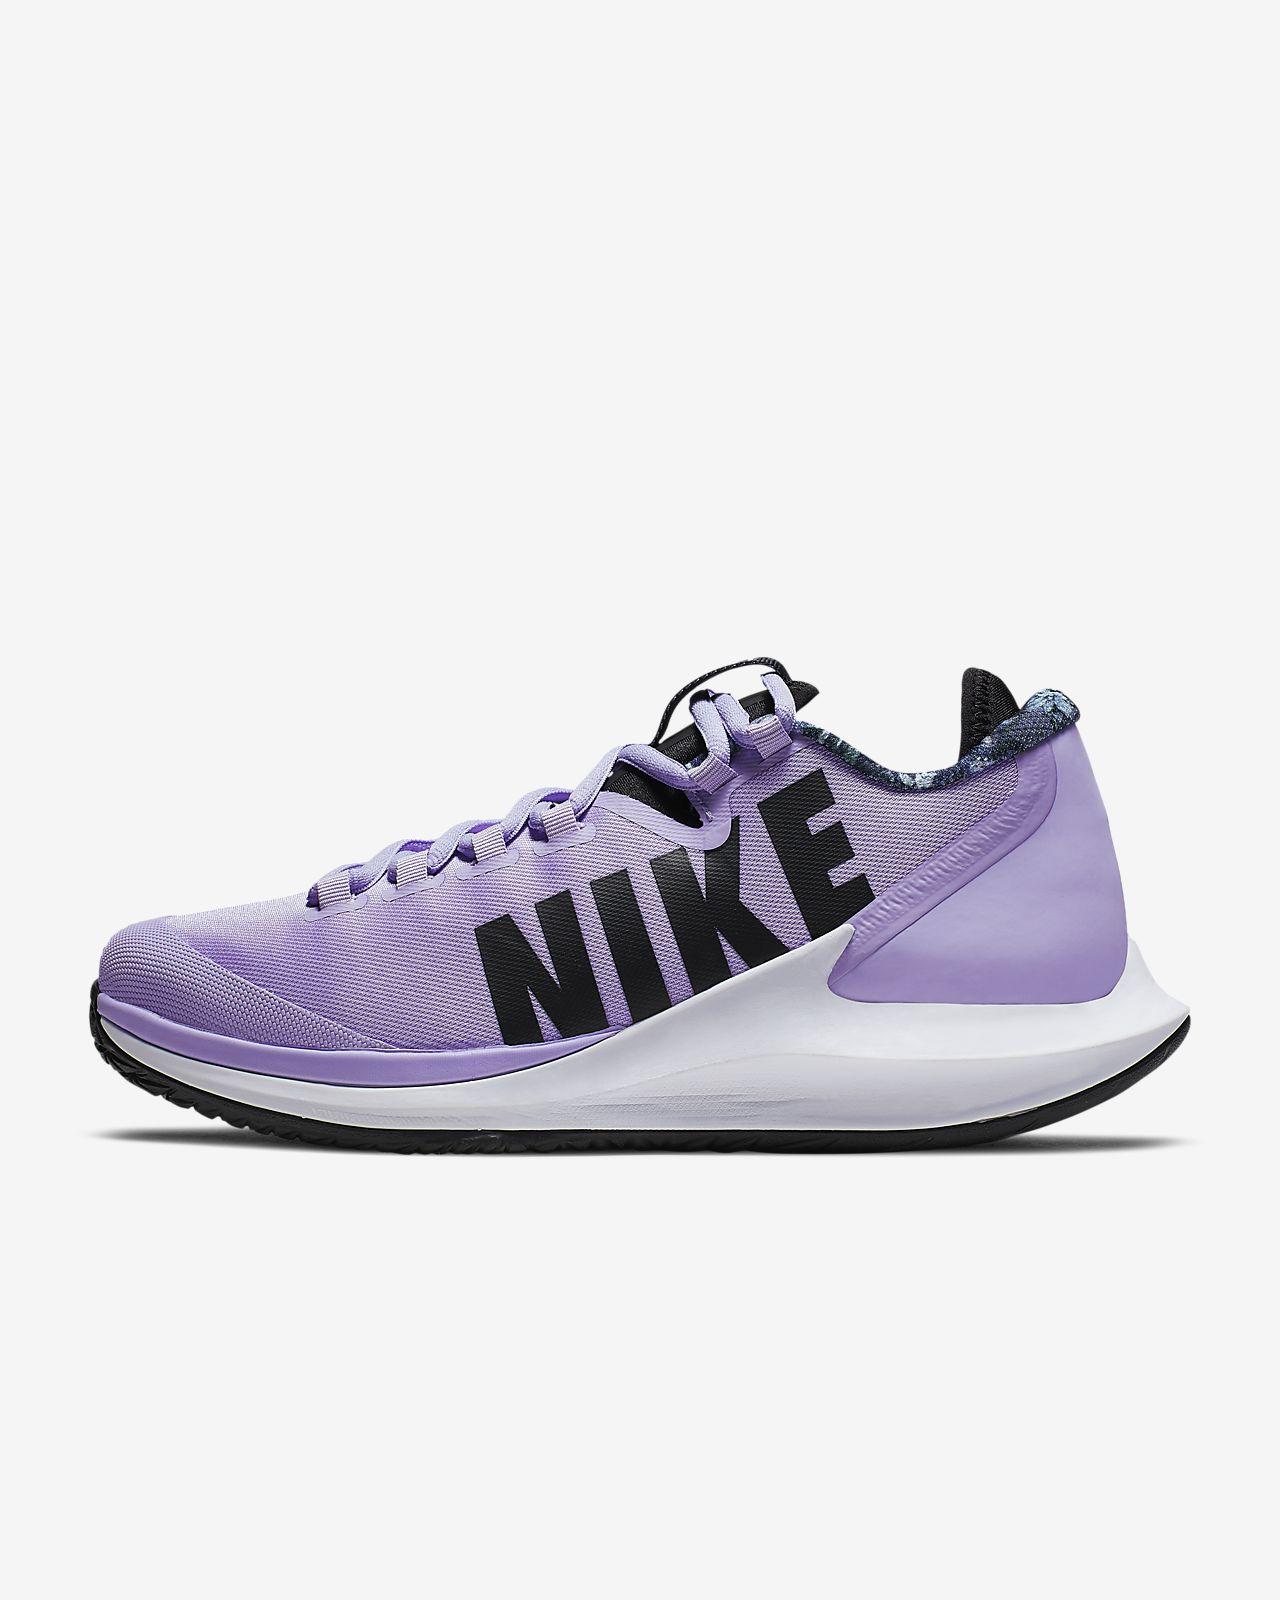 Dámská tenisová bota NikeCourt Air Zoom Zero